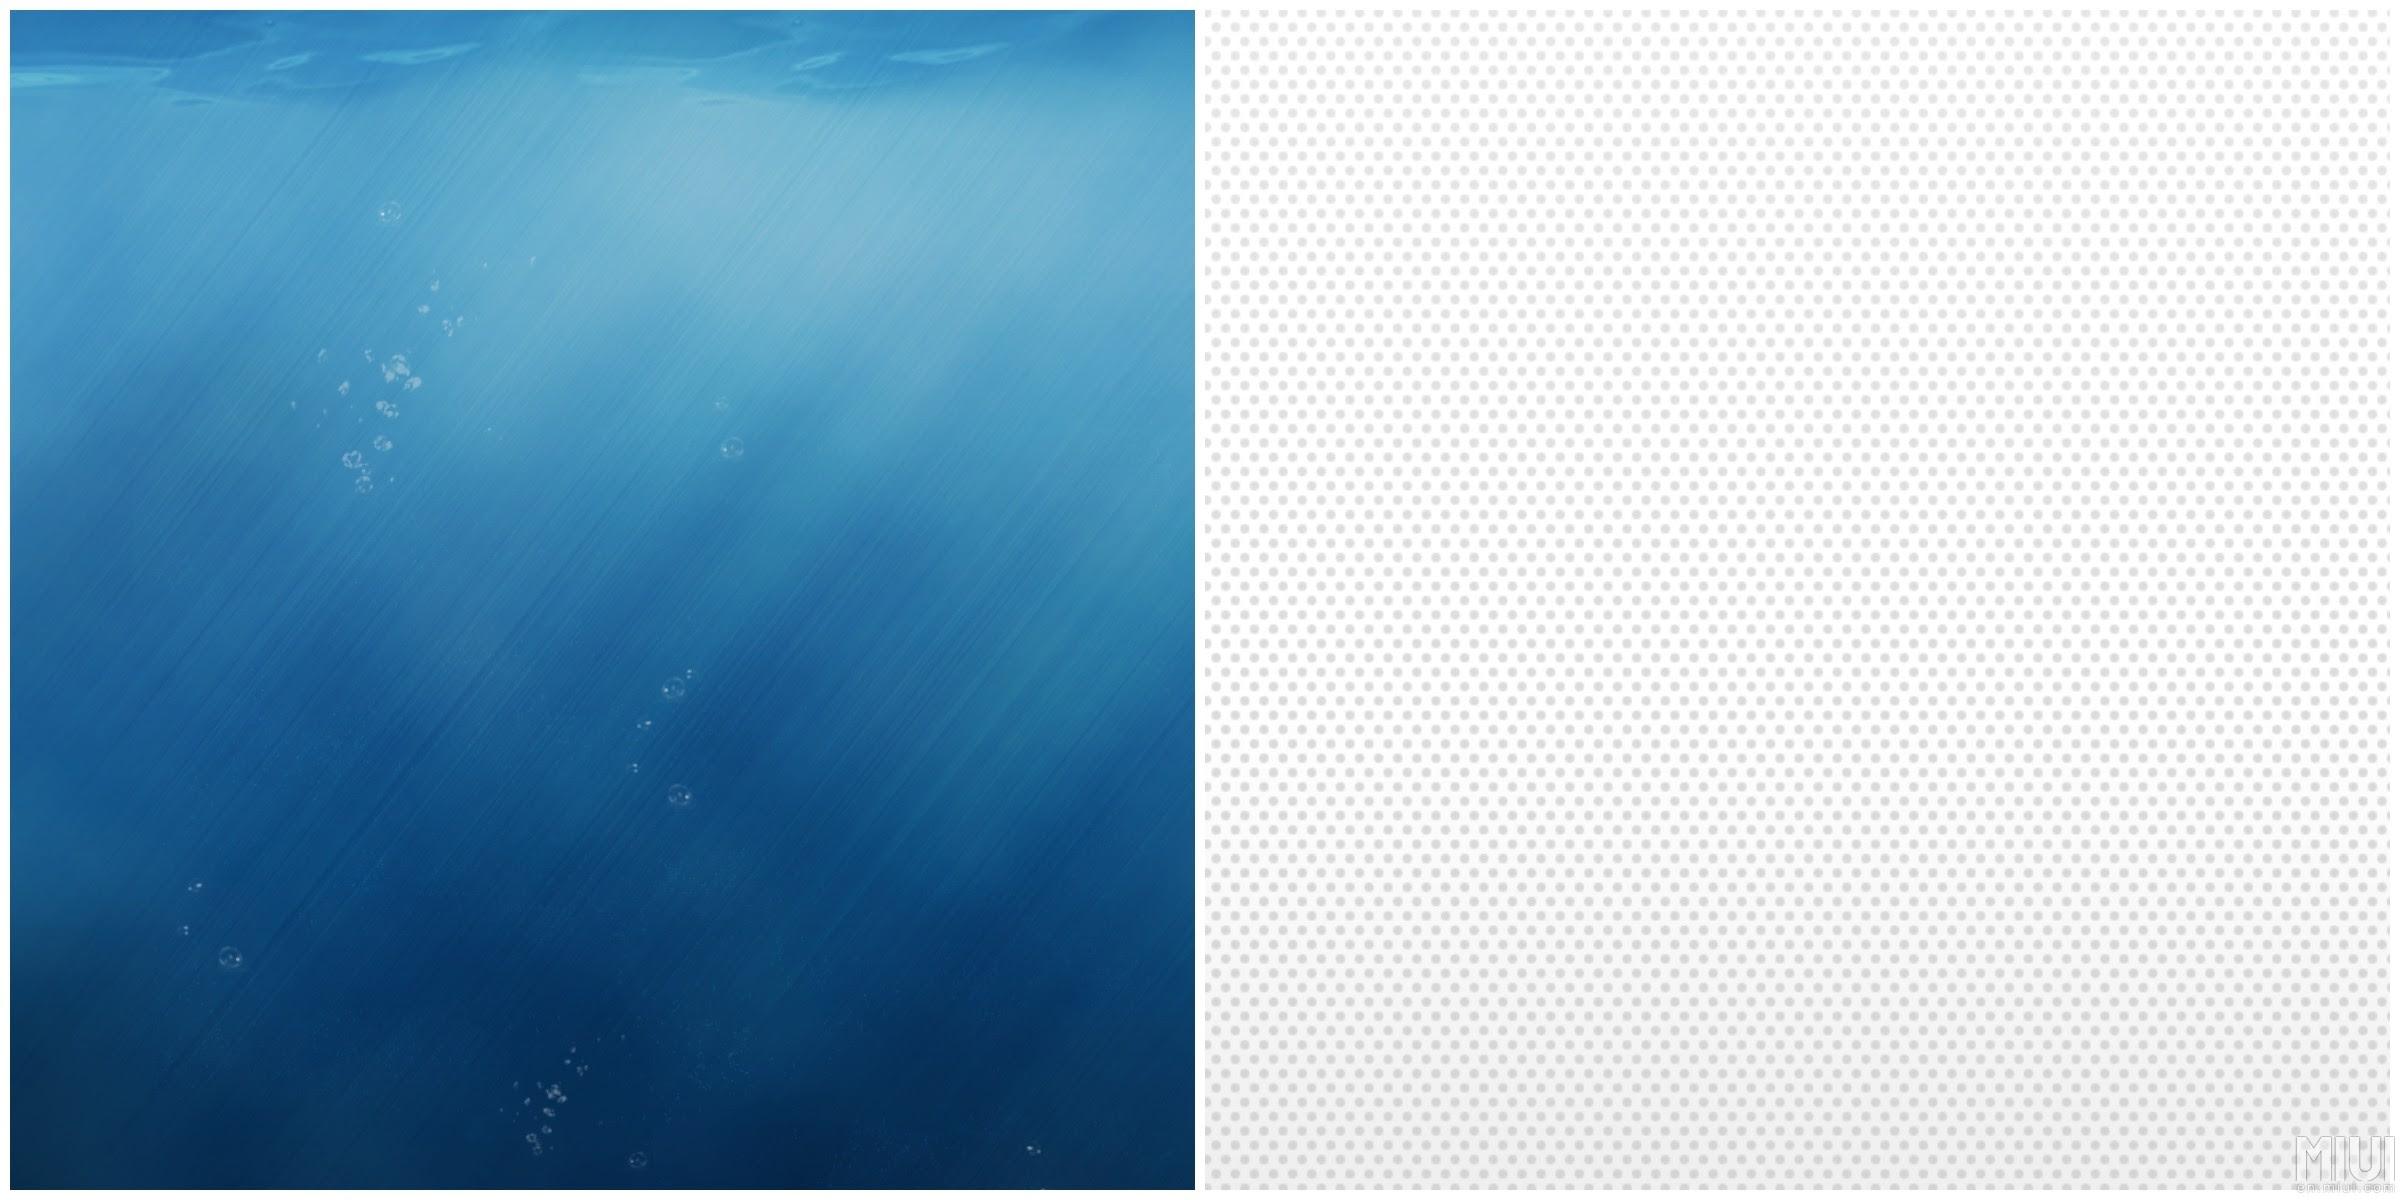 Ios 8 Default Wallpaper